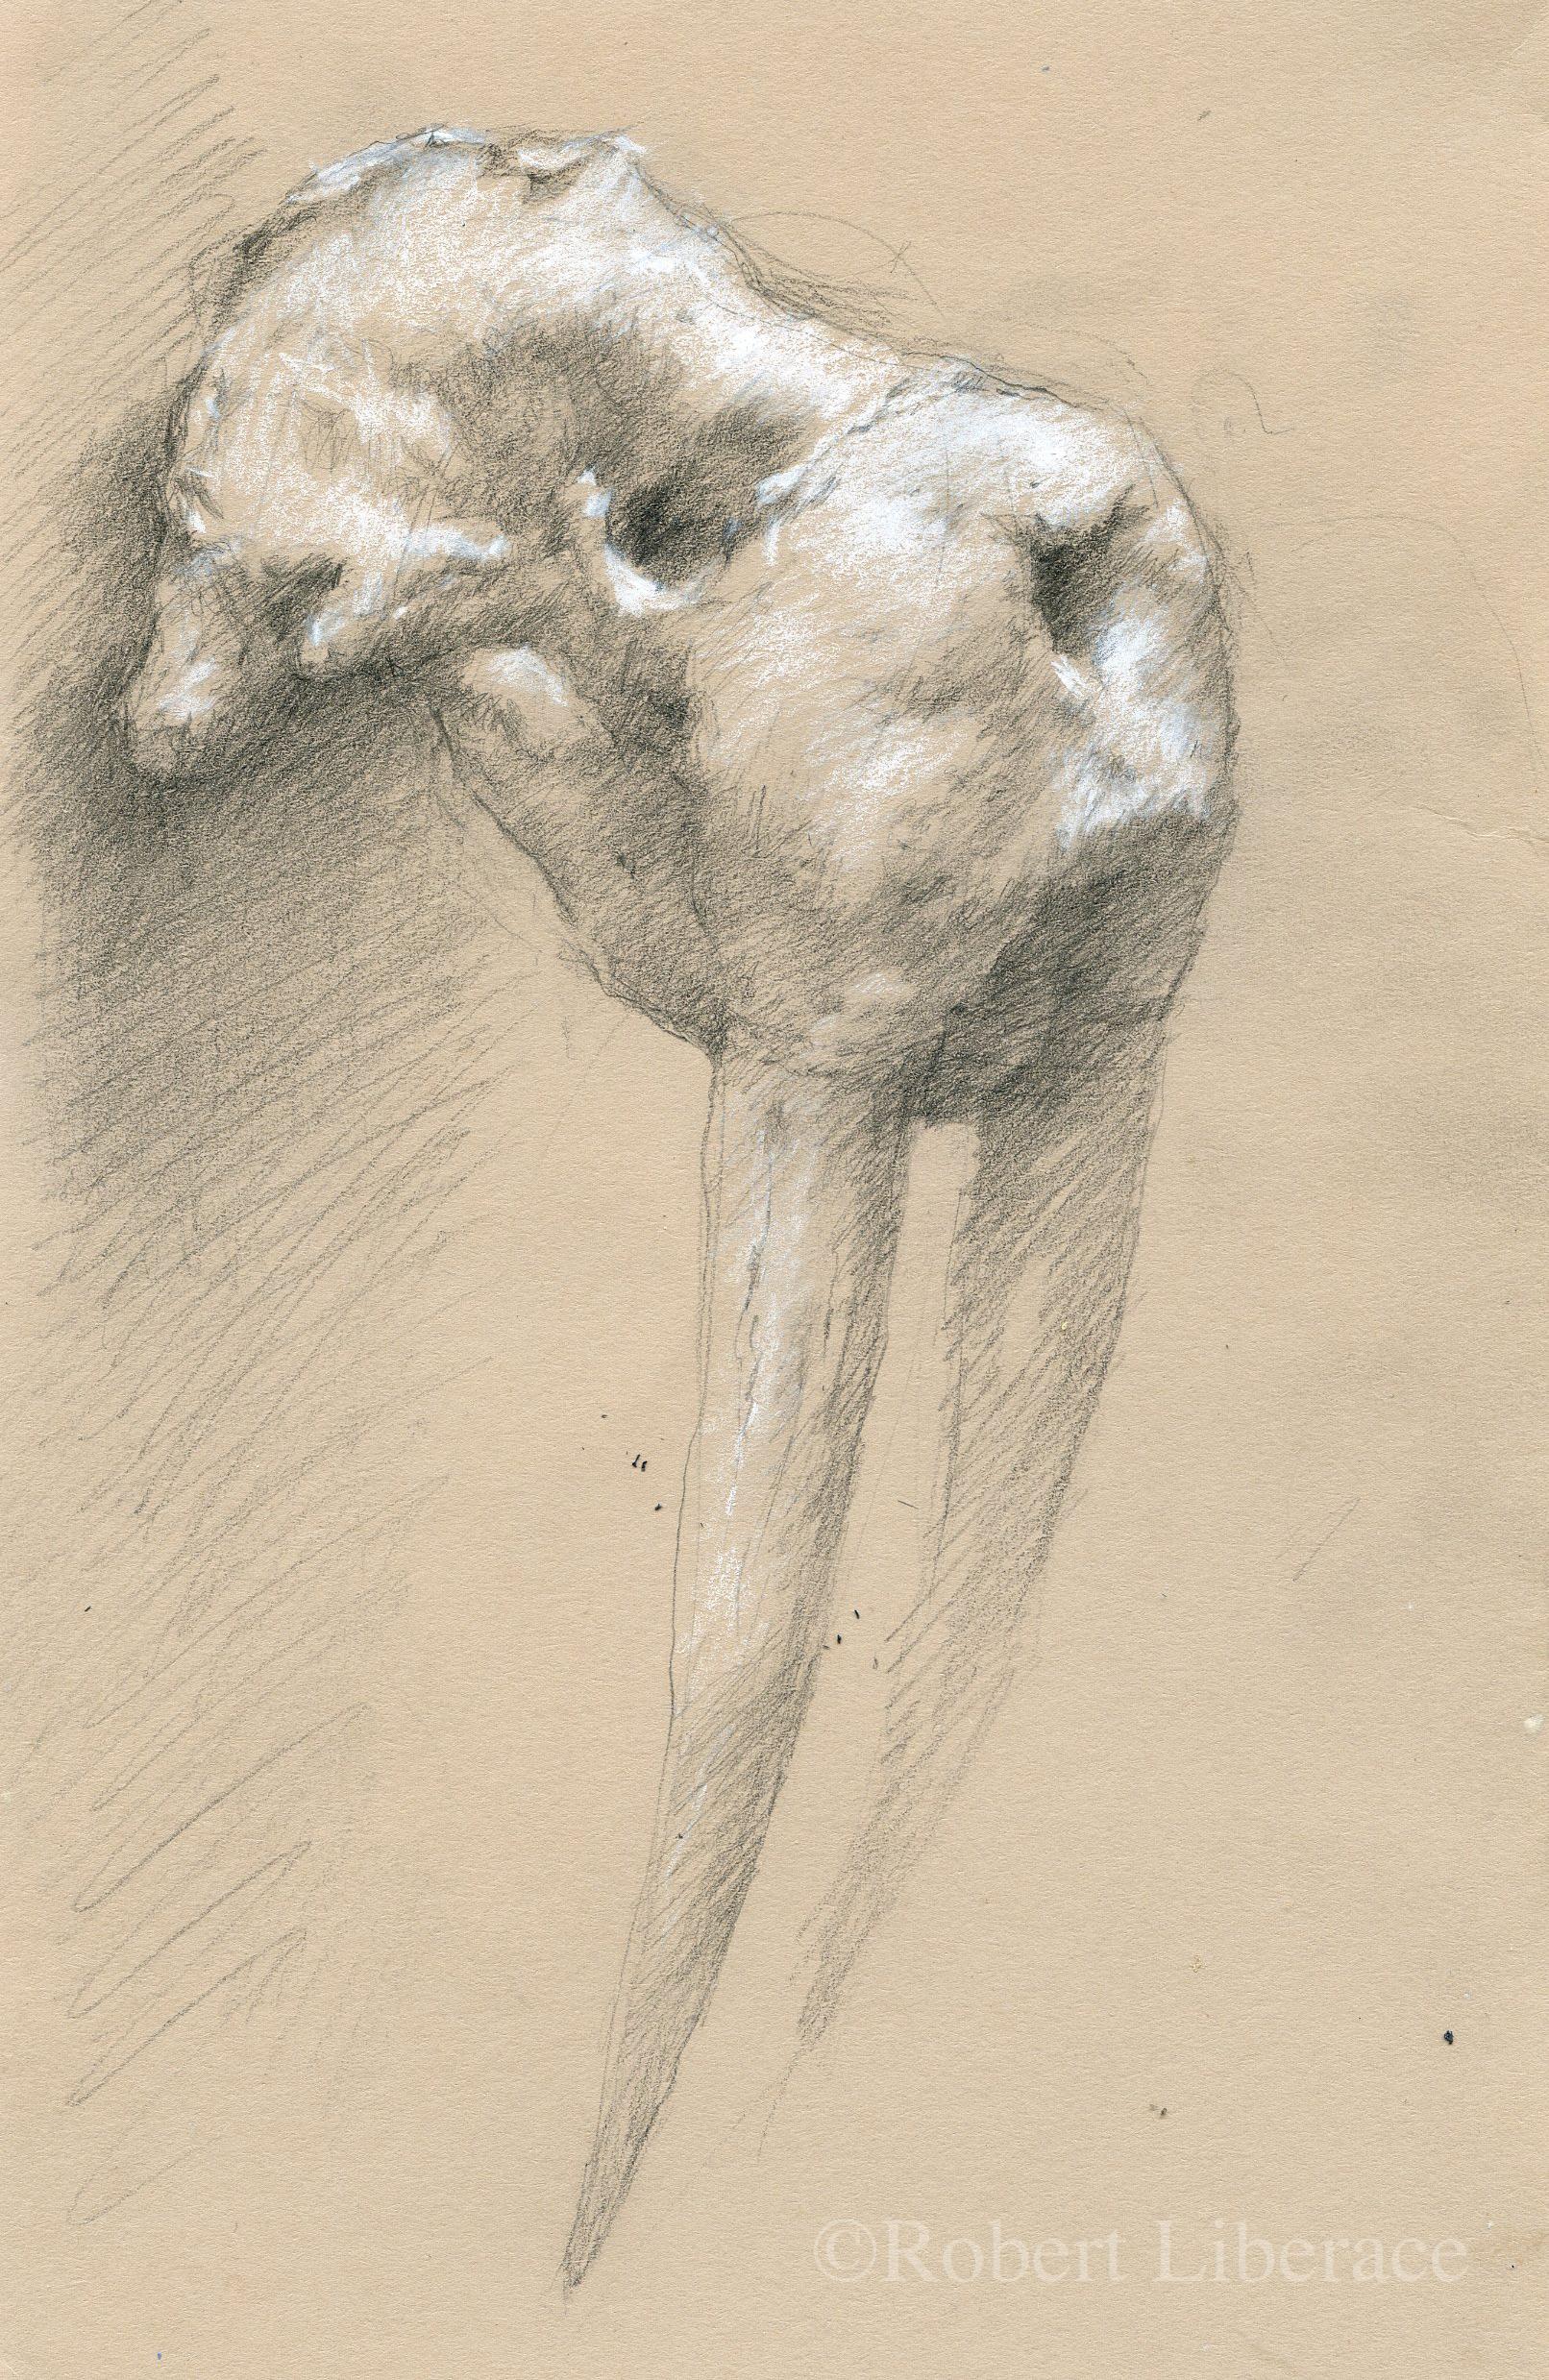 Robert Liberace walrus skull drawing charcoal chalk